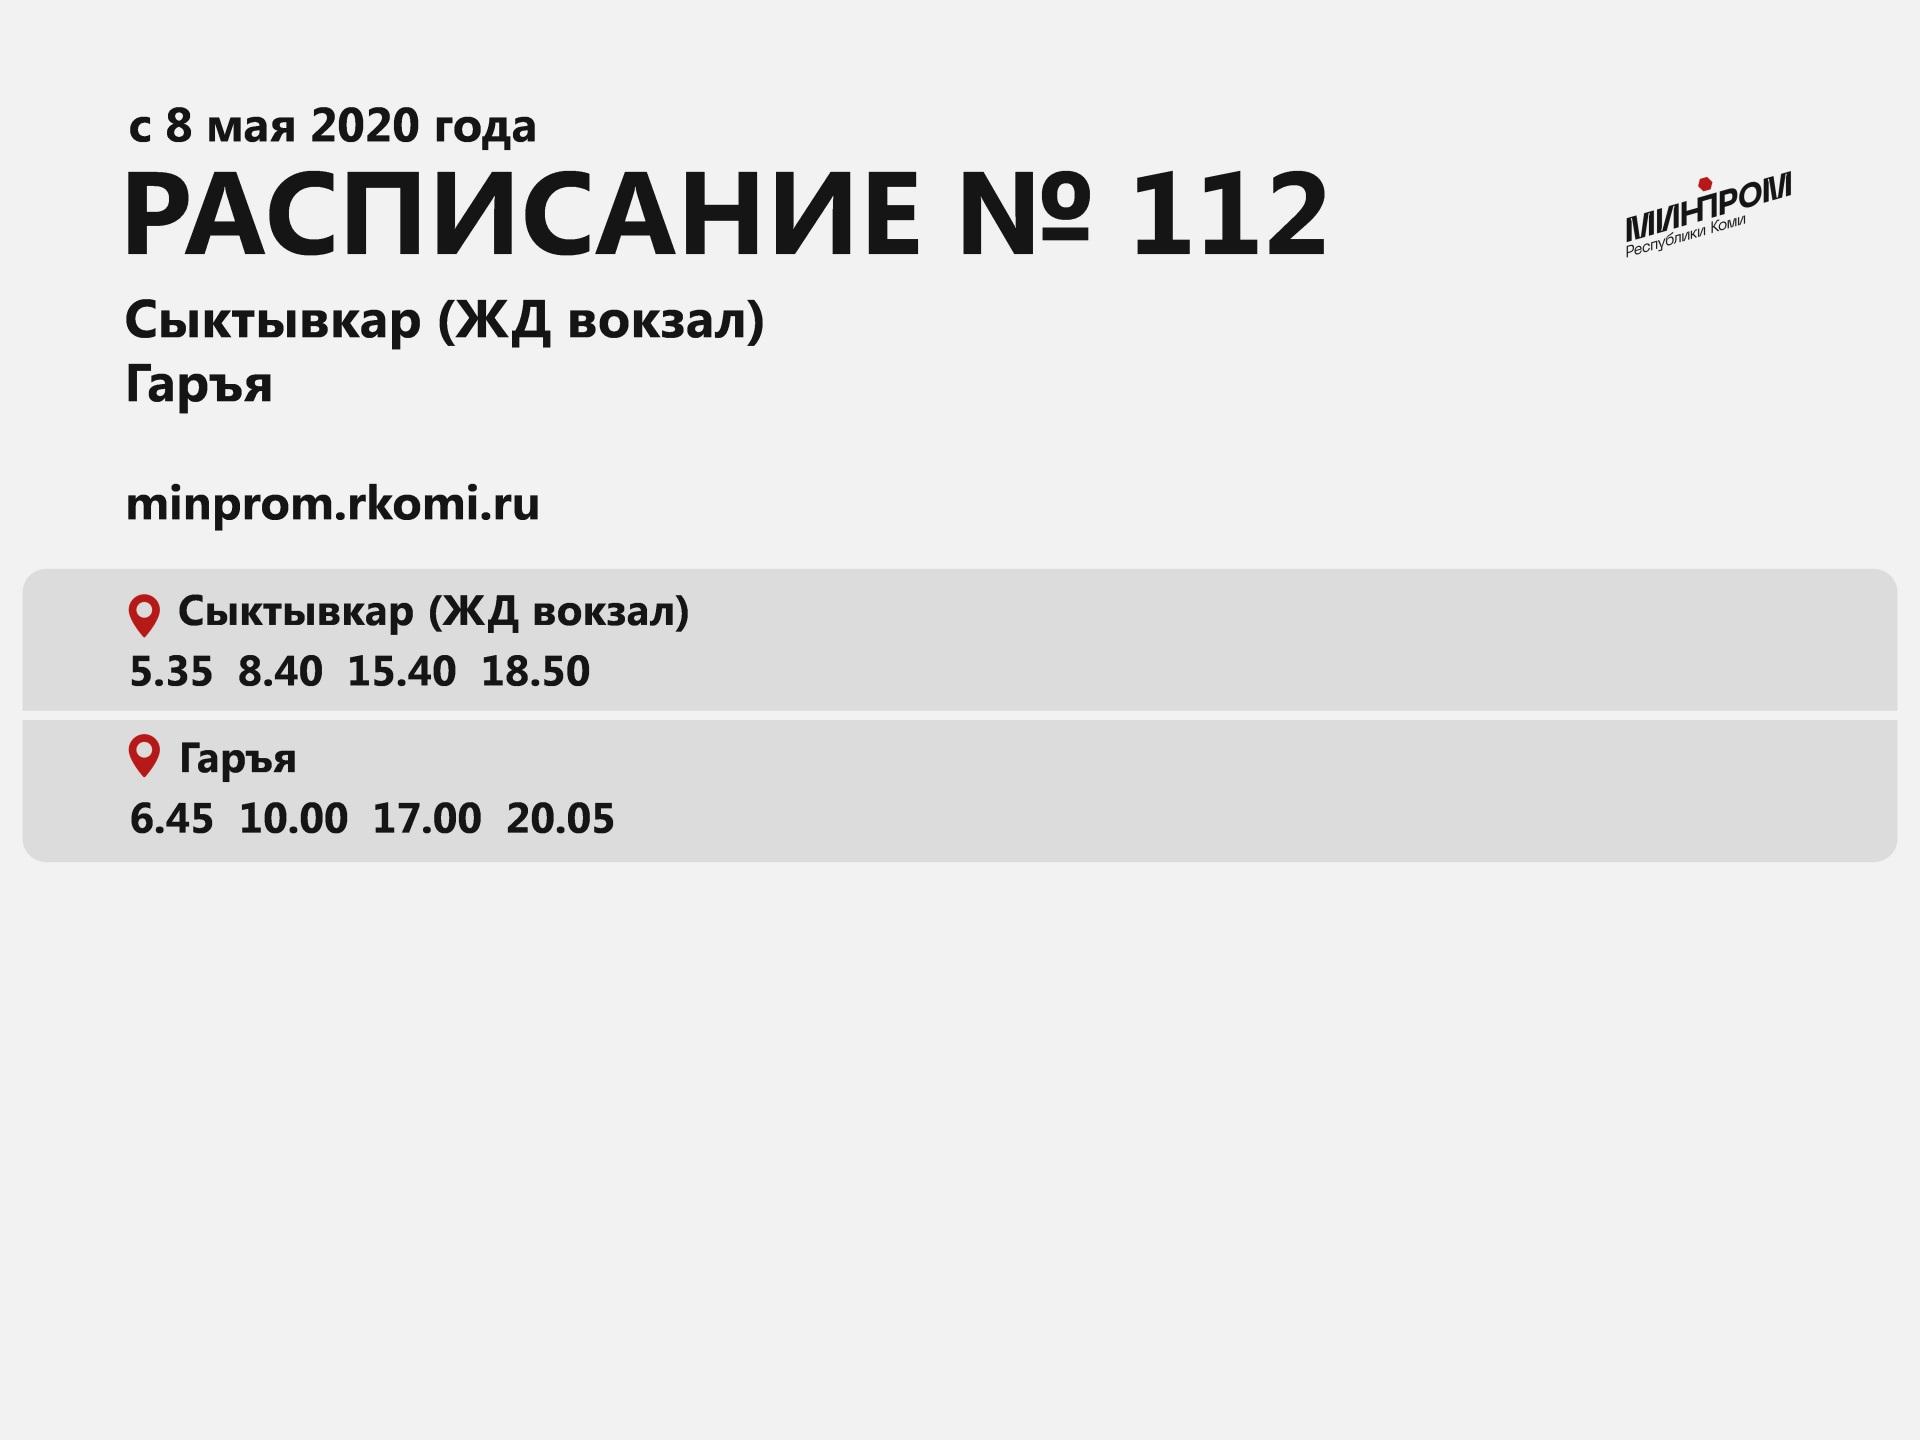 Raspisanie-112.jpg